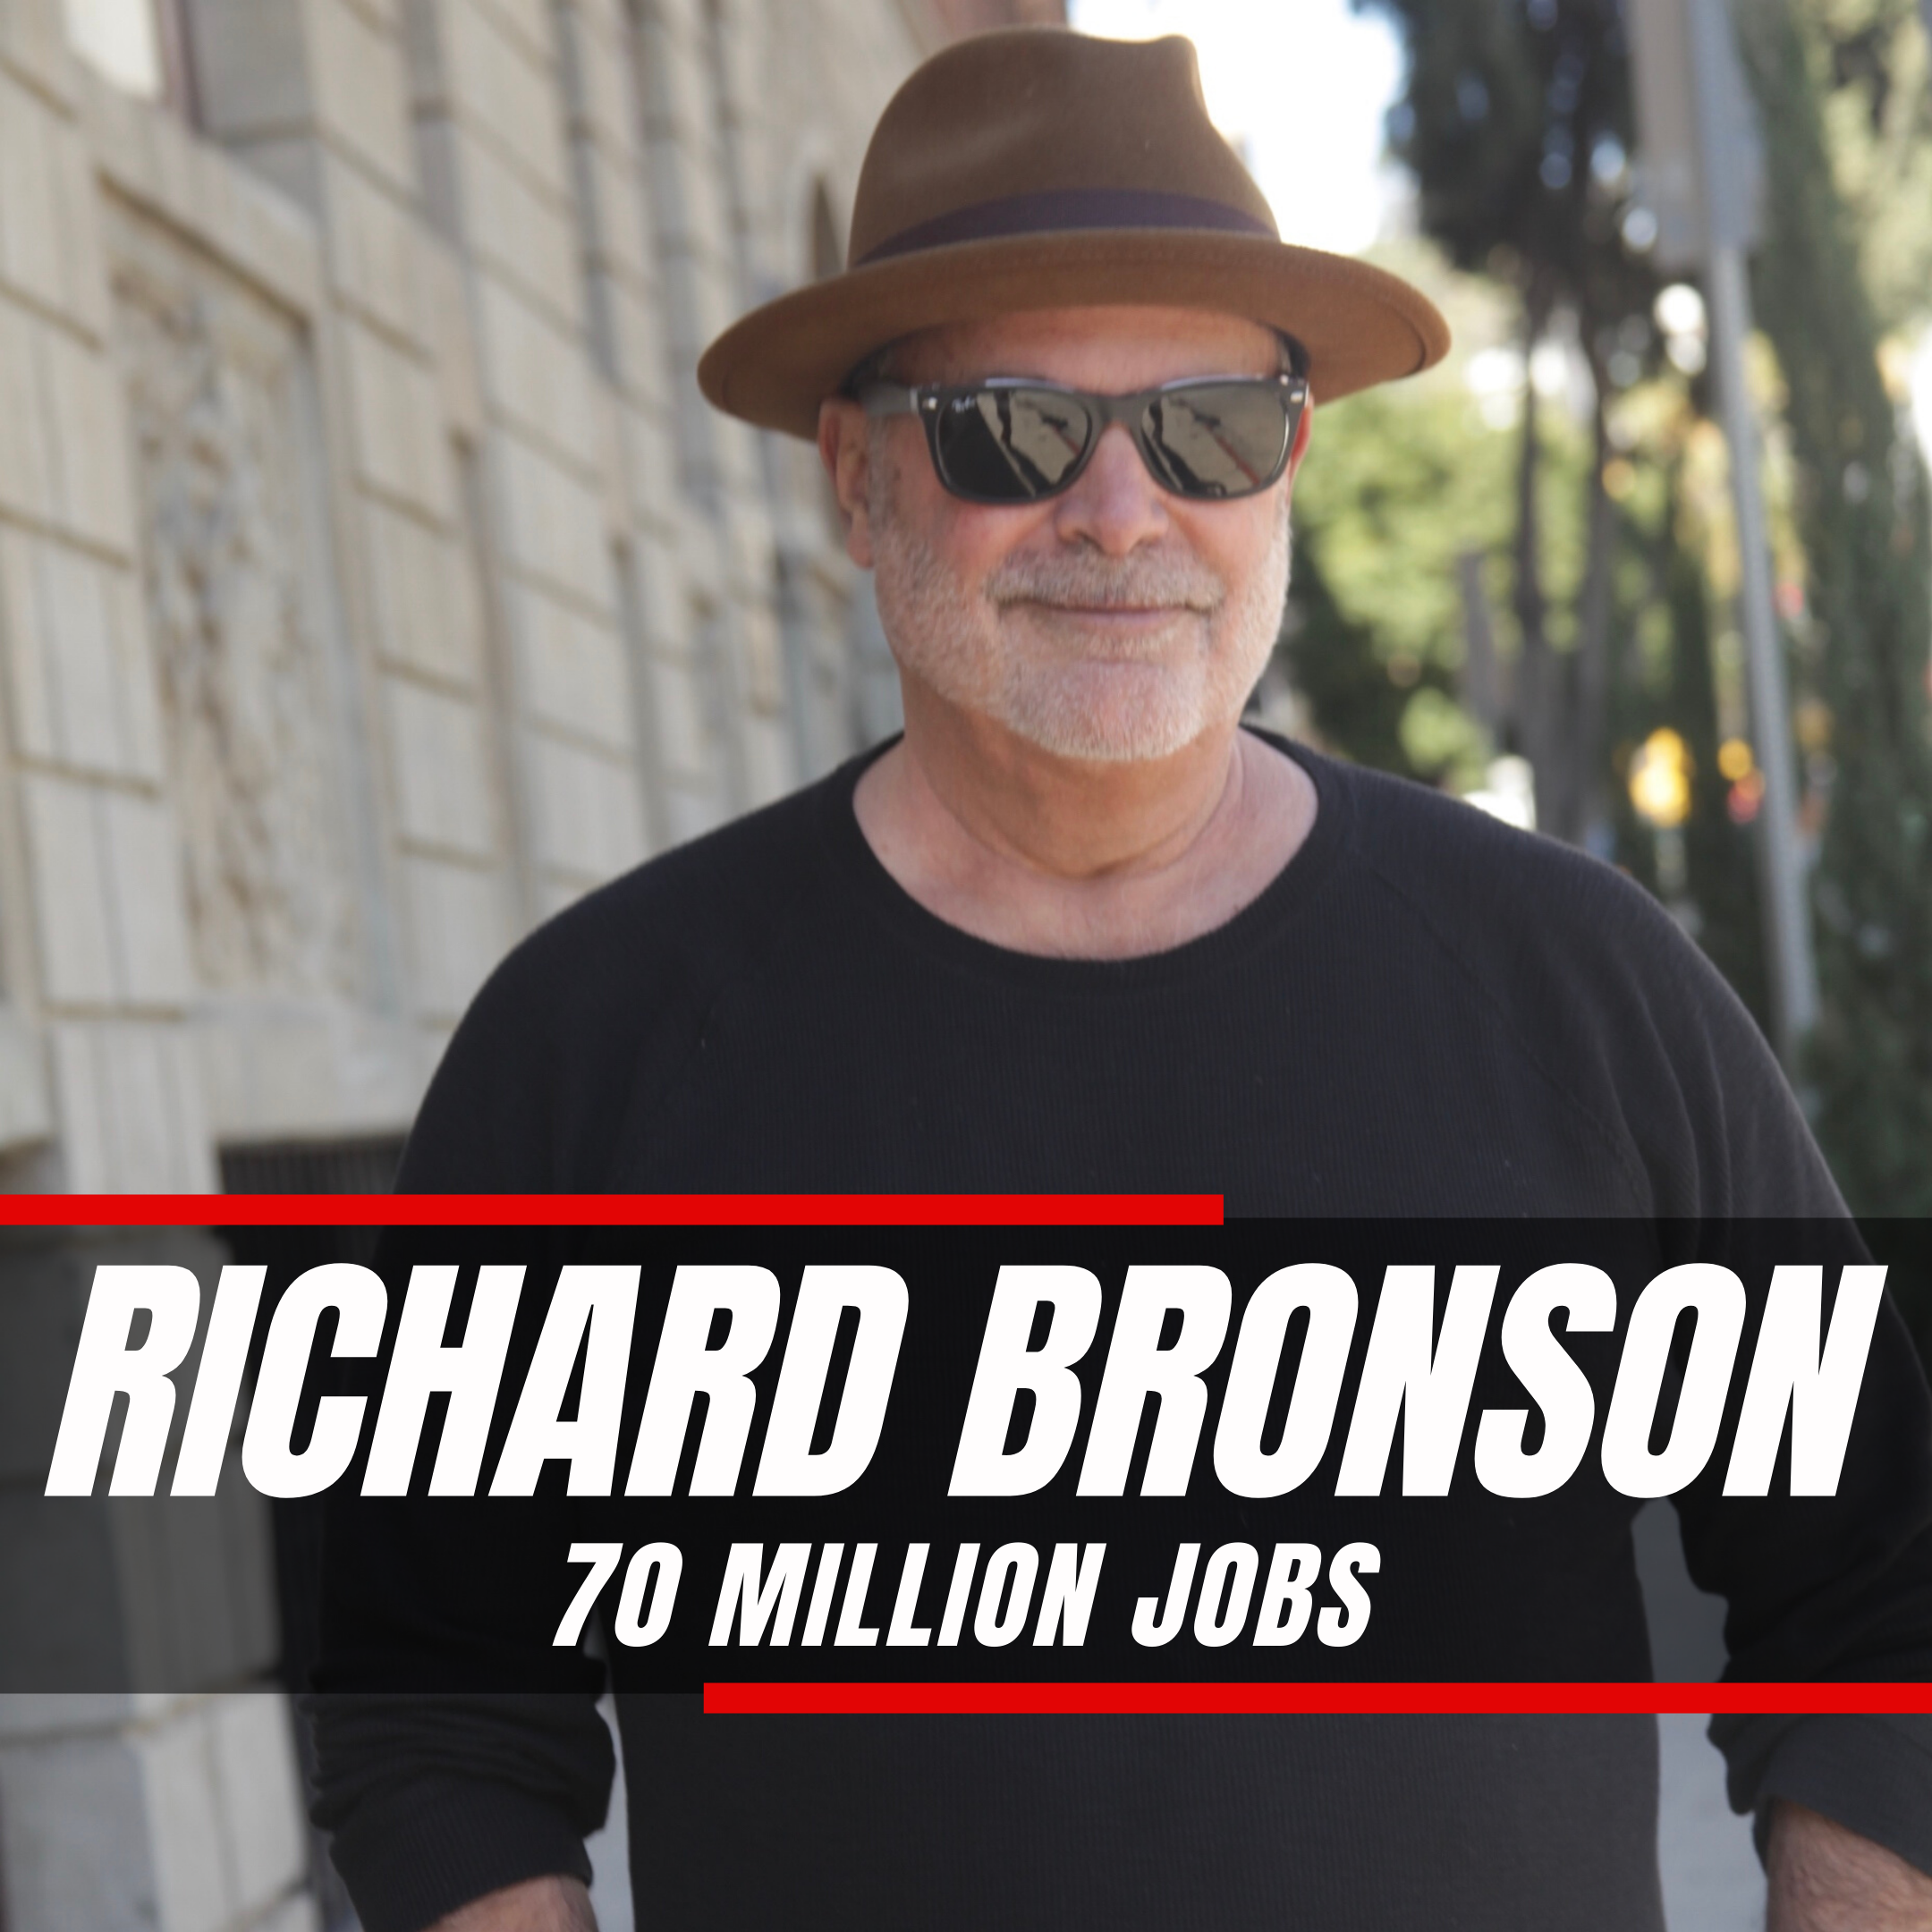 Richard Bronson